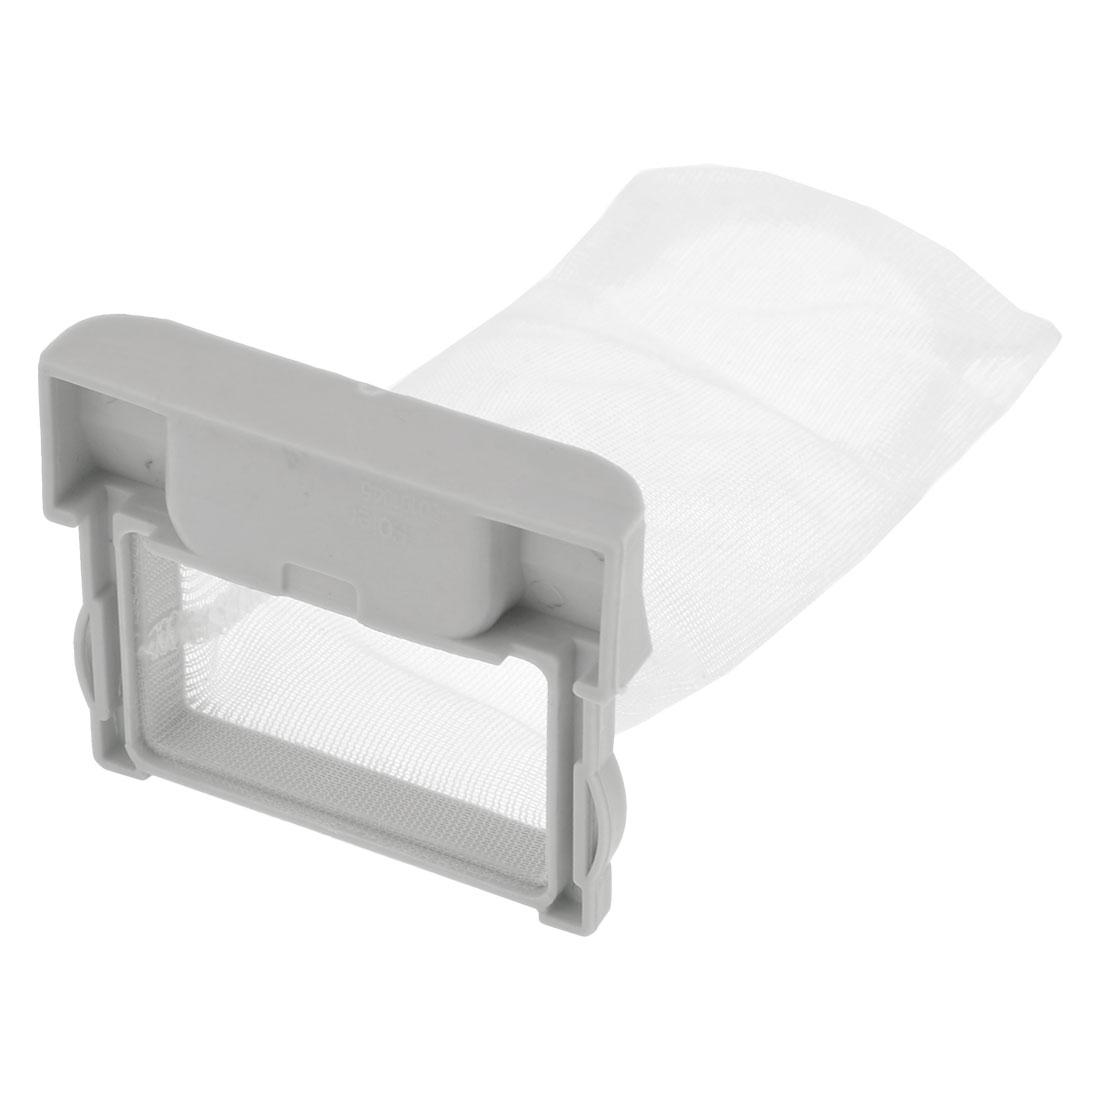 "White Plastic Nylon Filter Bag Spare Part 4.7"" x 2.4"" Mesh for Washing Machine"